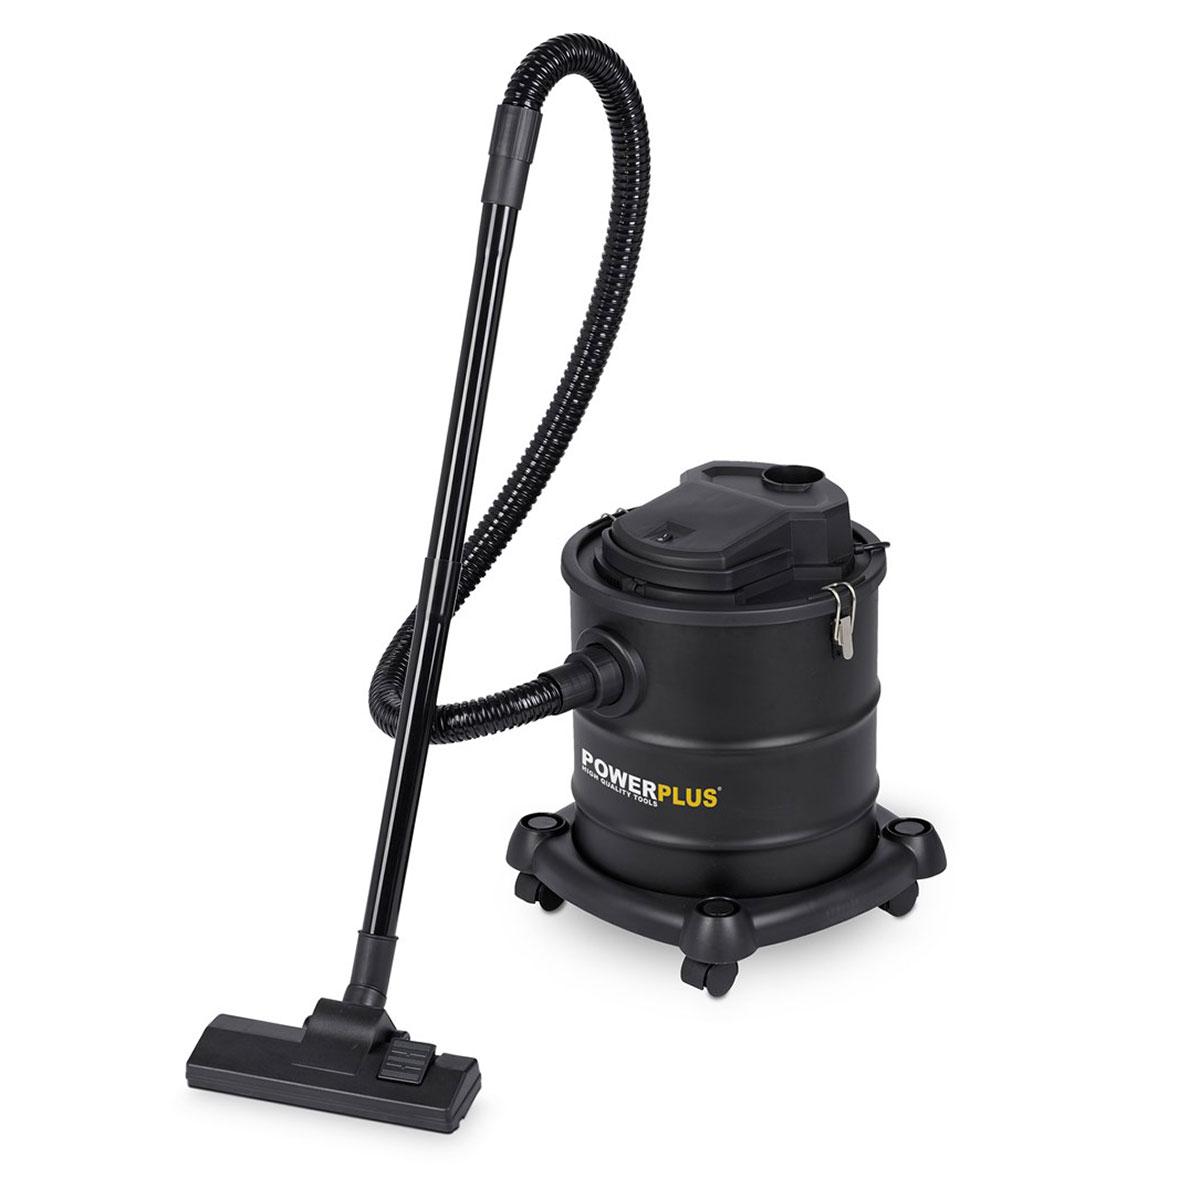 Powerplus 1200w 20l Ash Bbq Fireplace Cleaner Vacuum Cleaner Powx308 Ebay